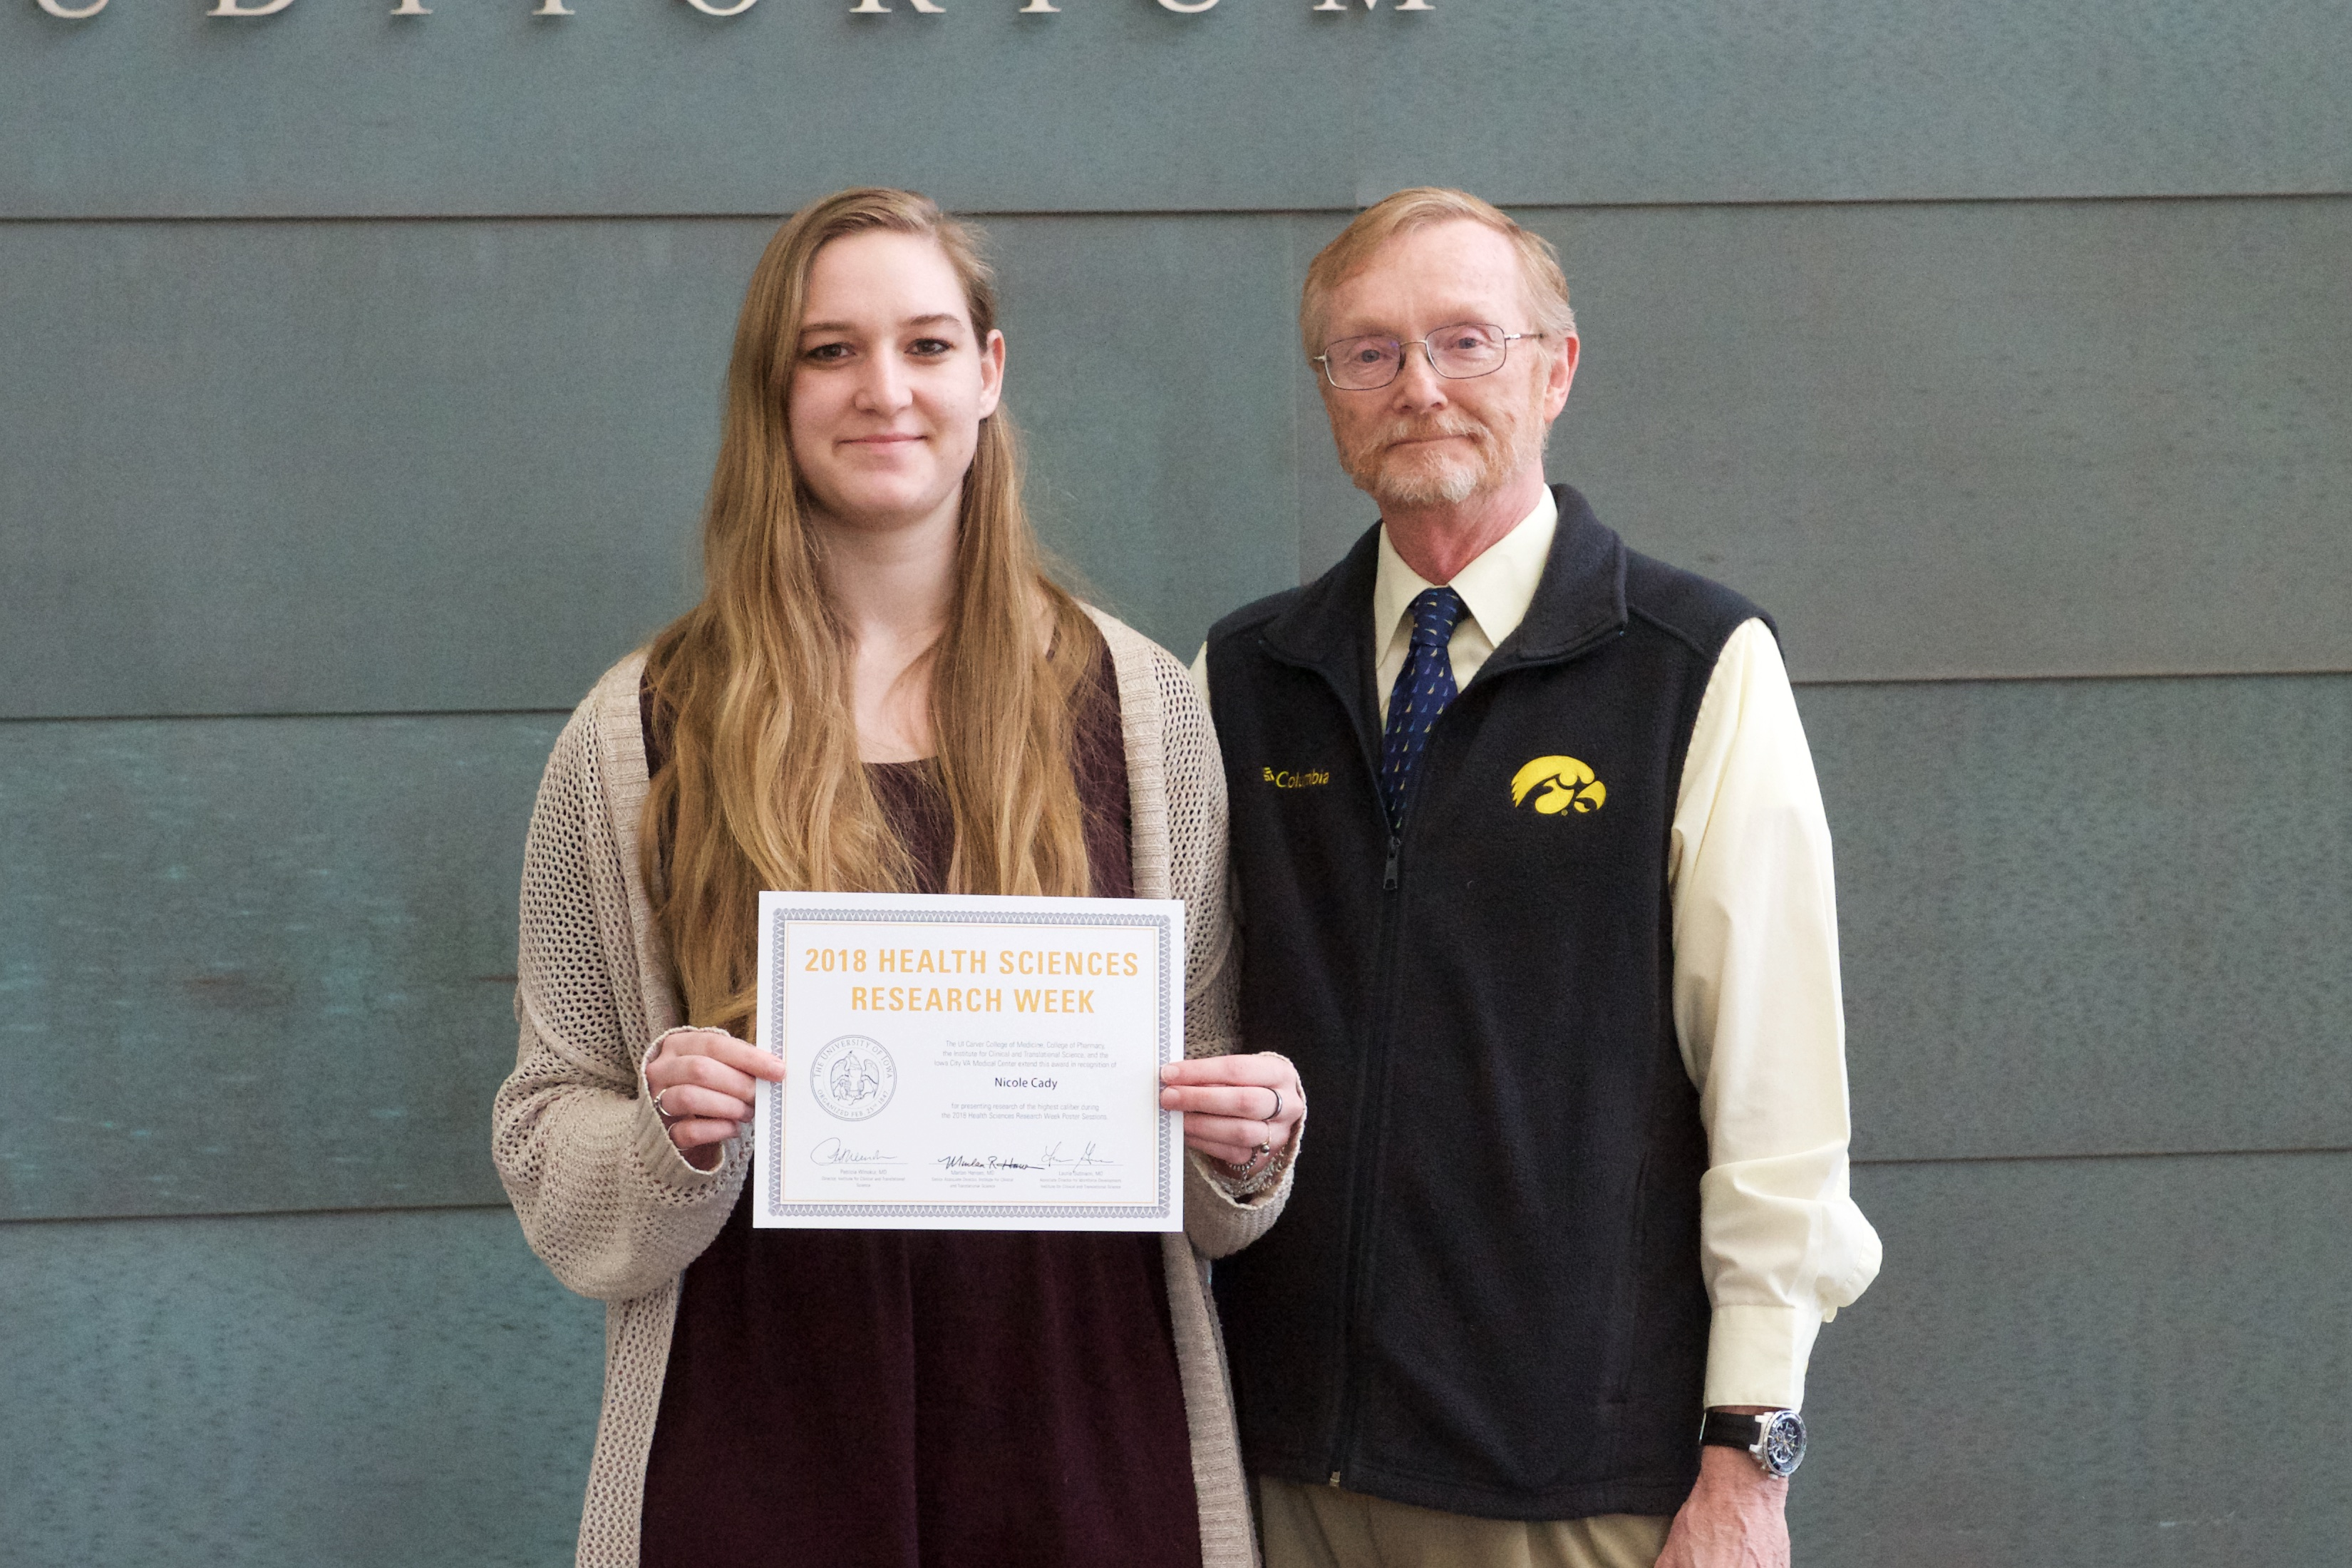 Nicole Cady receiving award